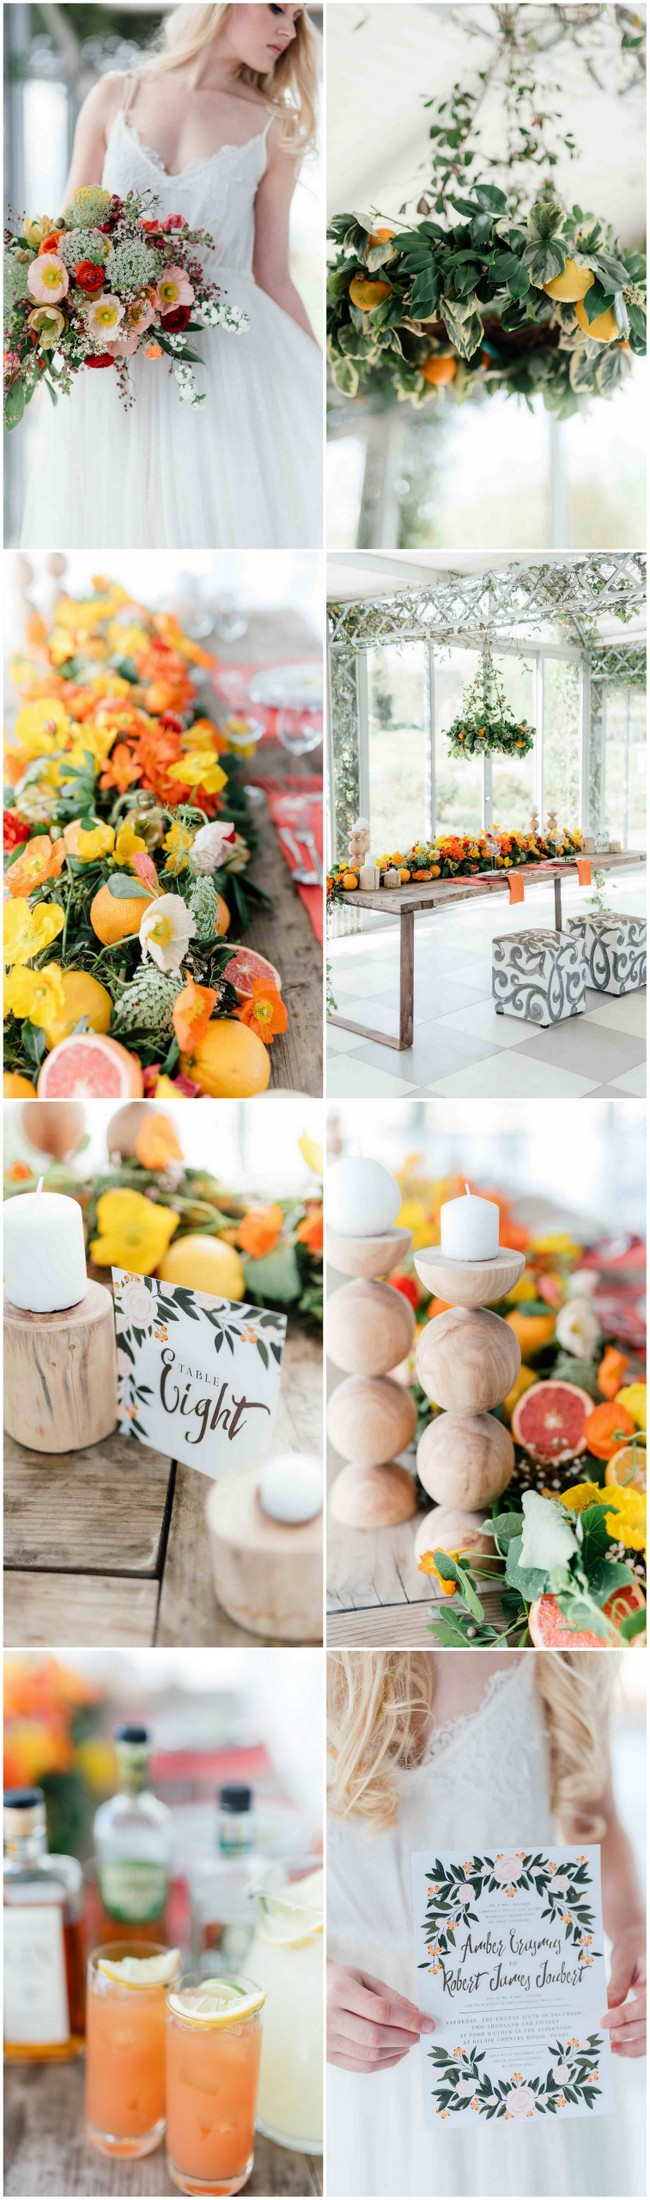 Citrus Wedding Ideas 2